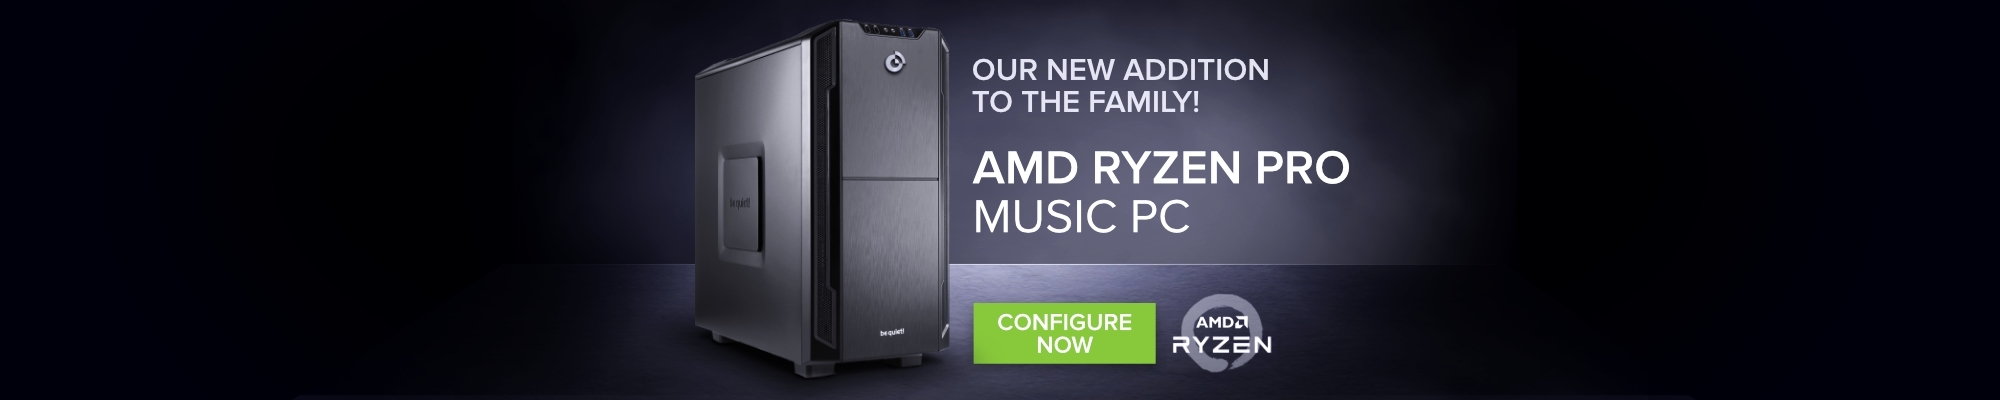 AMD RYZEN PRO Music PC